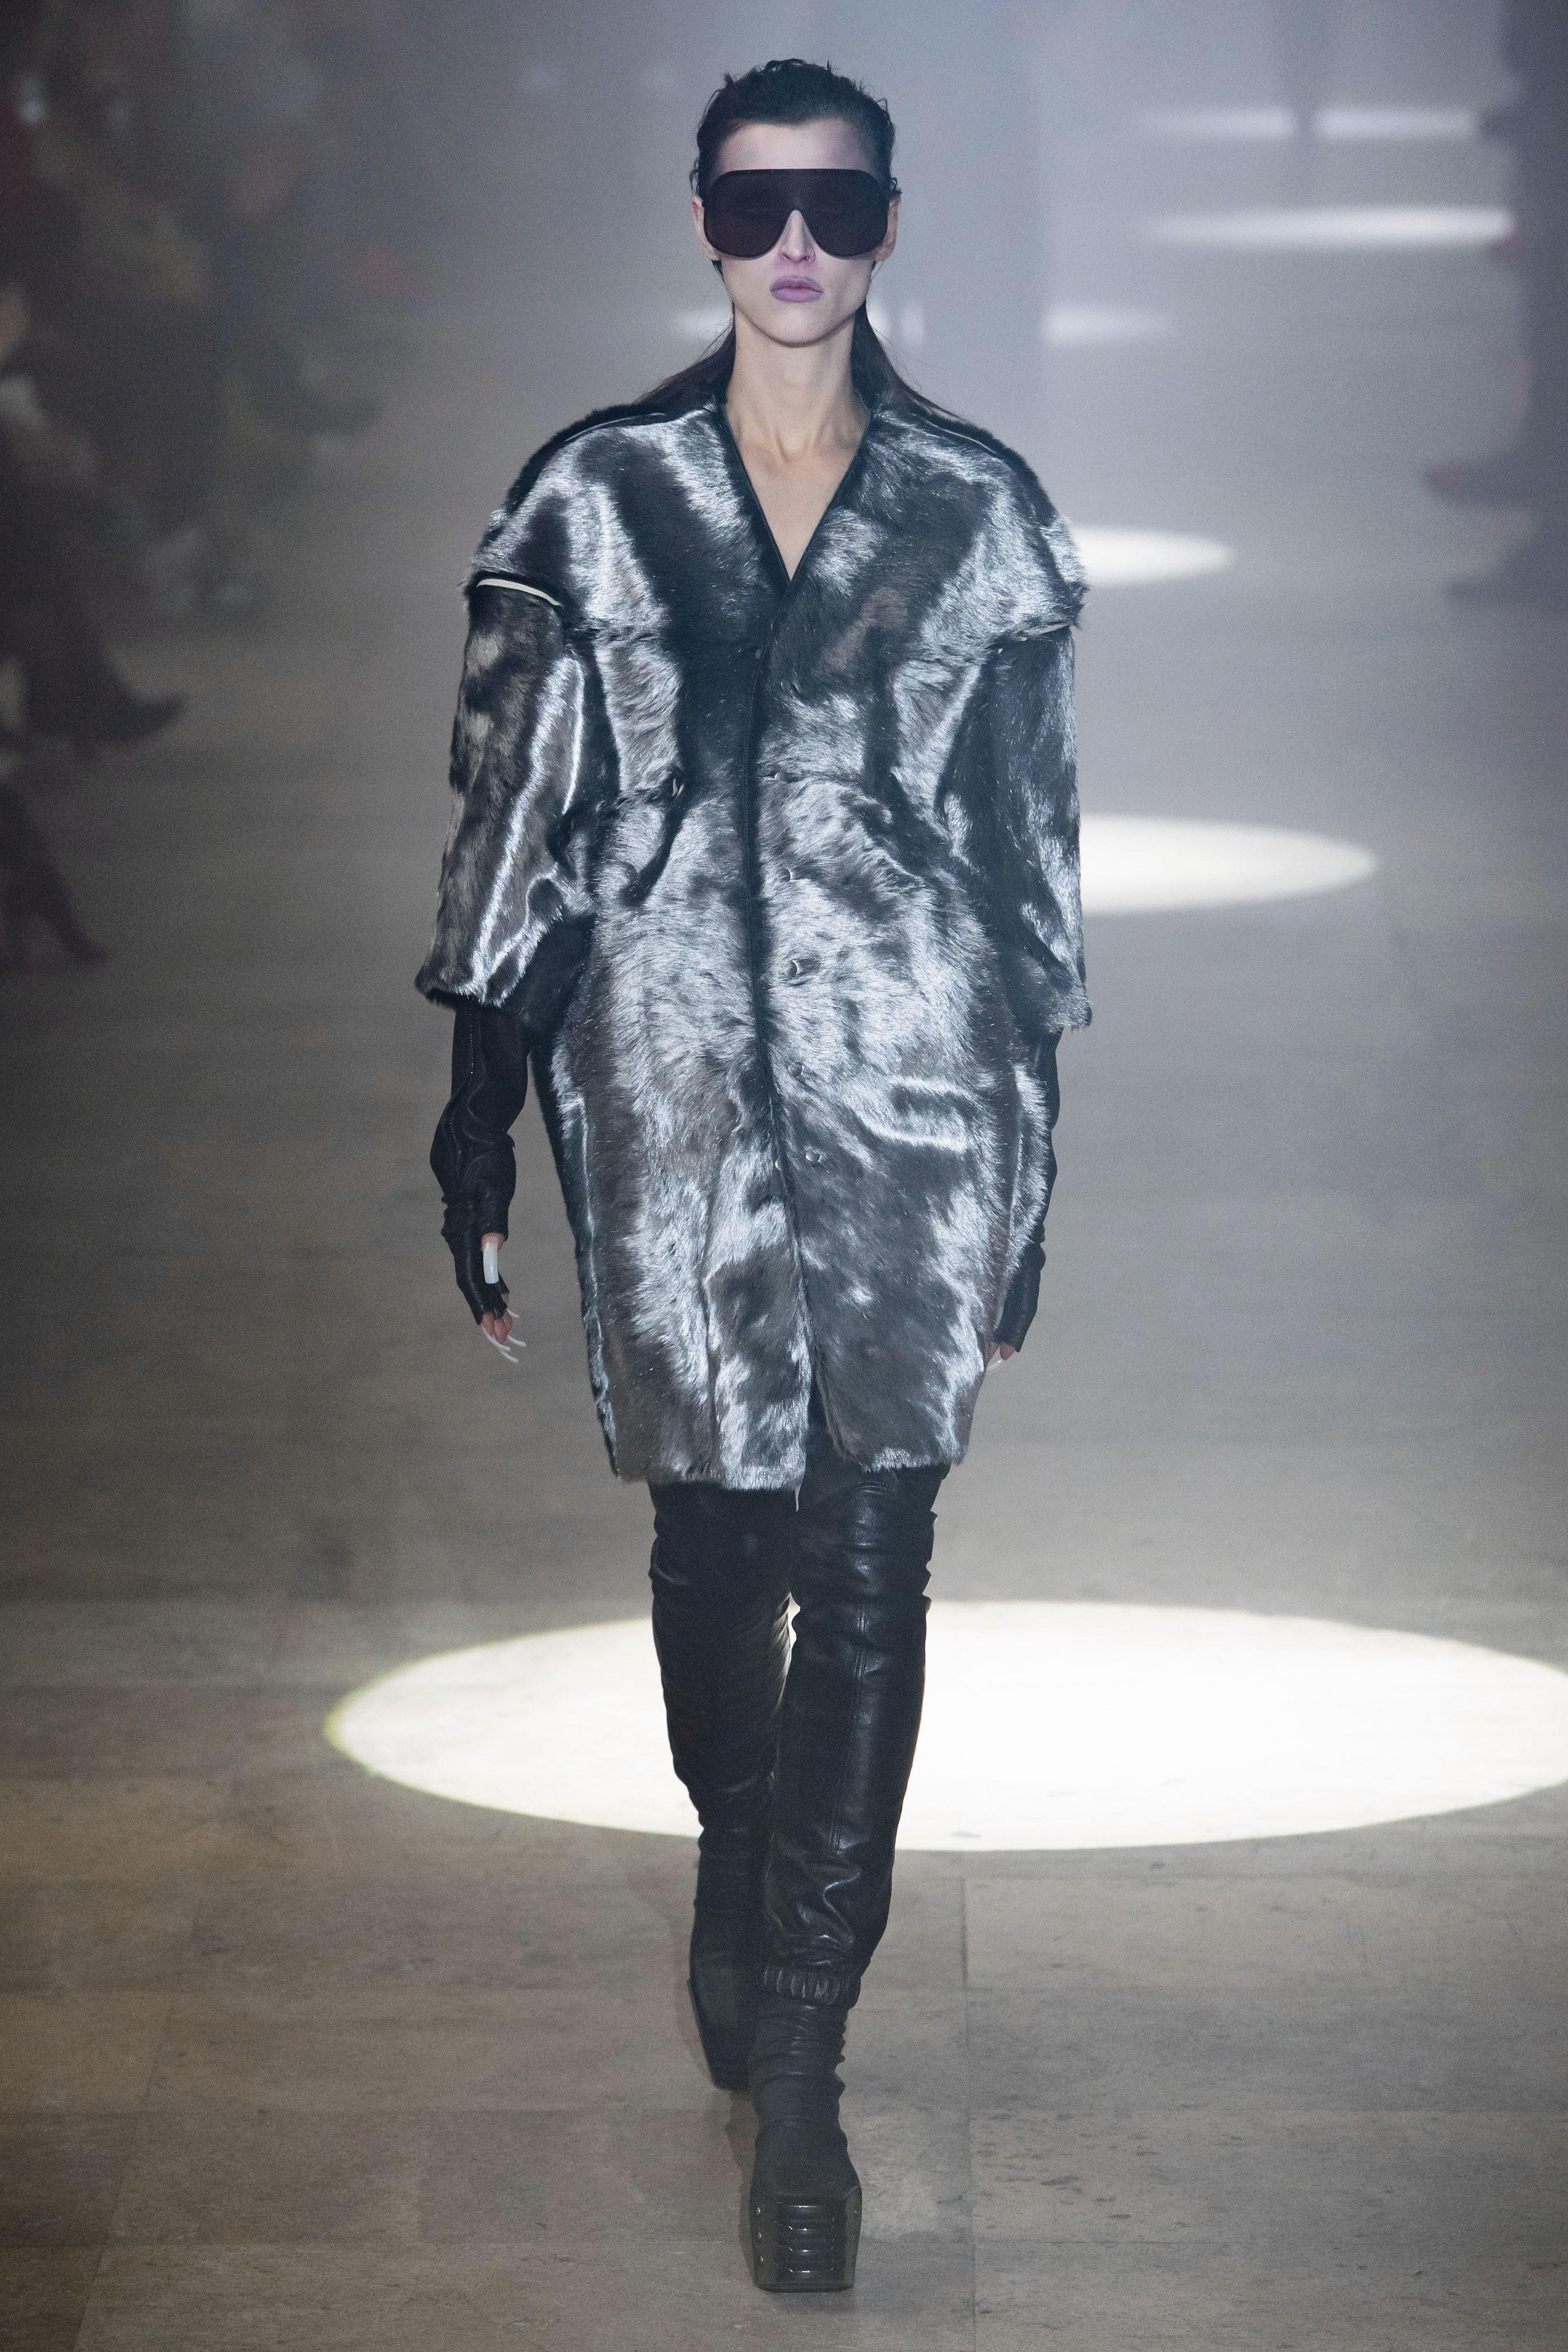 AP-Fashion_The_Advance_Designers_@Saks